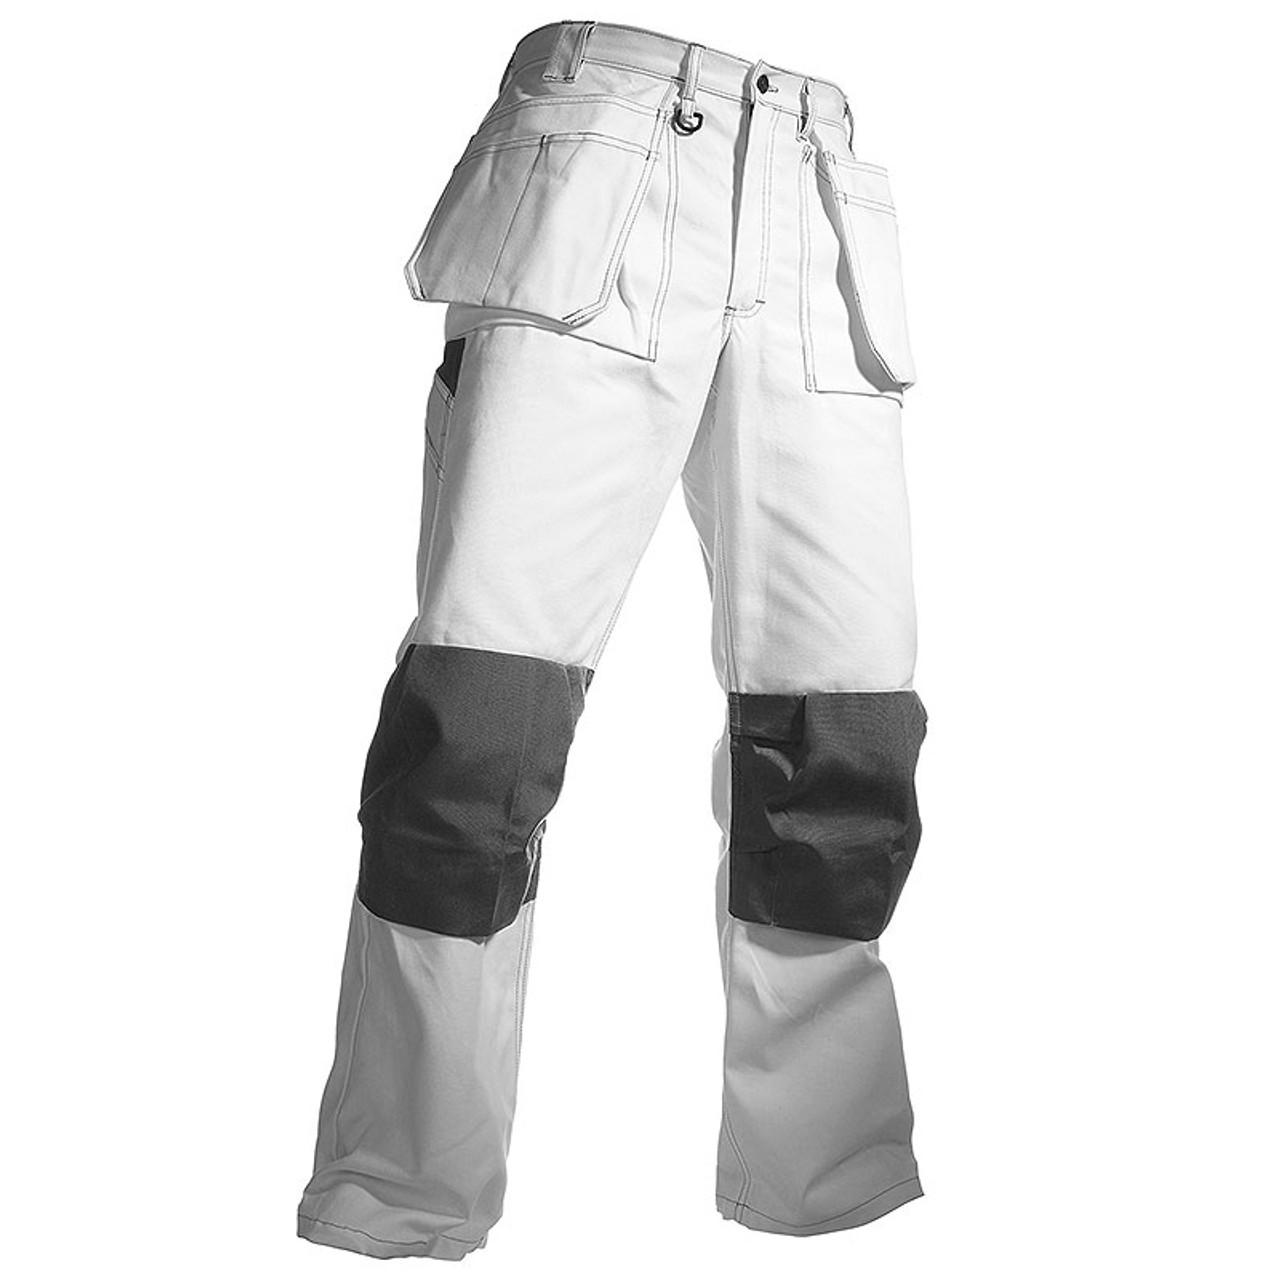 Kanon Blaklader Painter Pants 11 oz White BL-1631-1210 AK-28